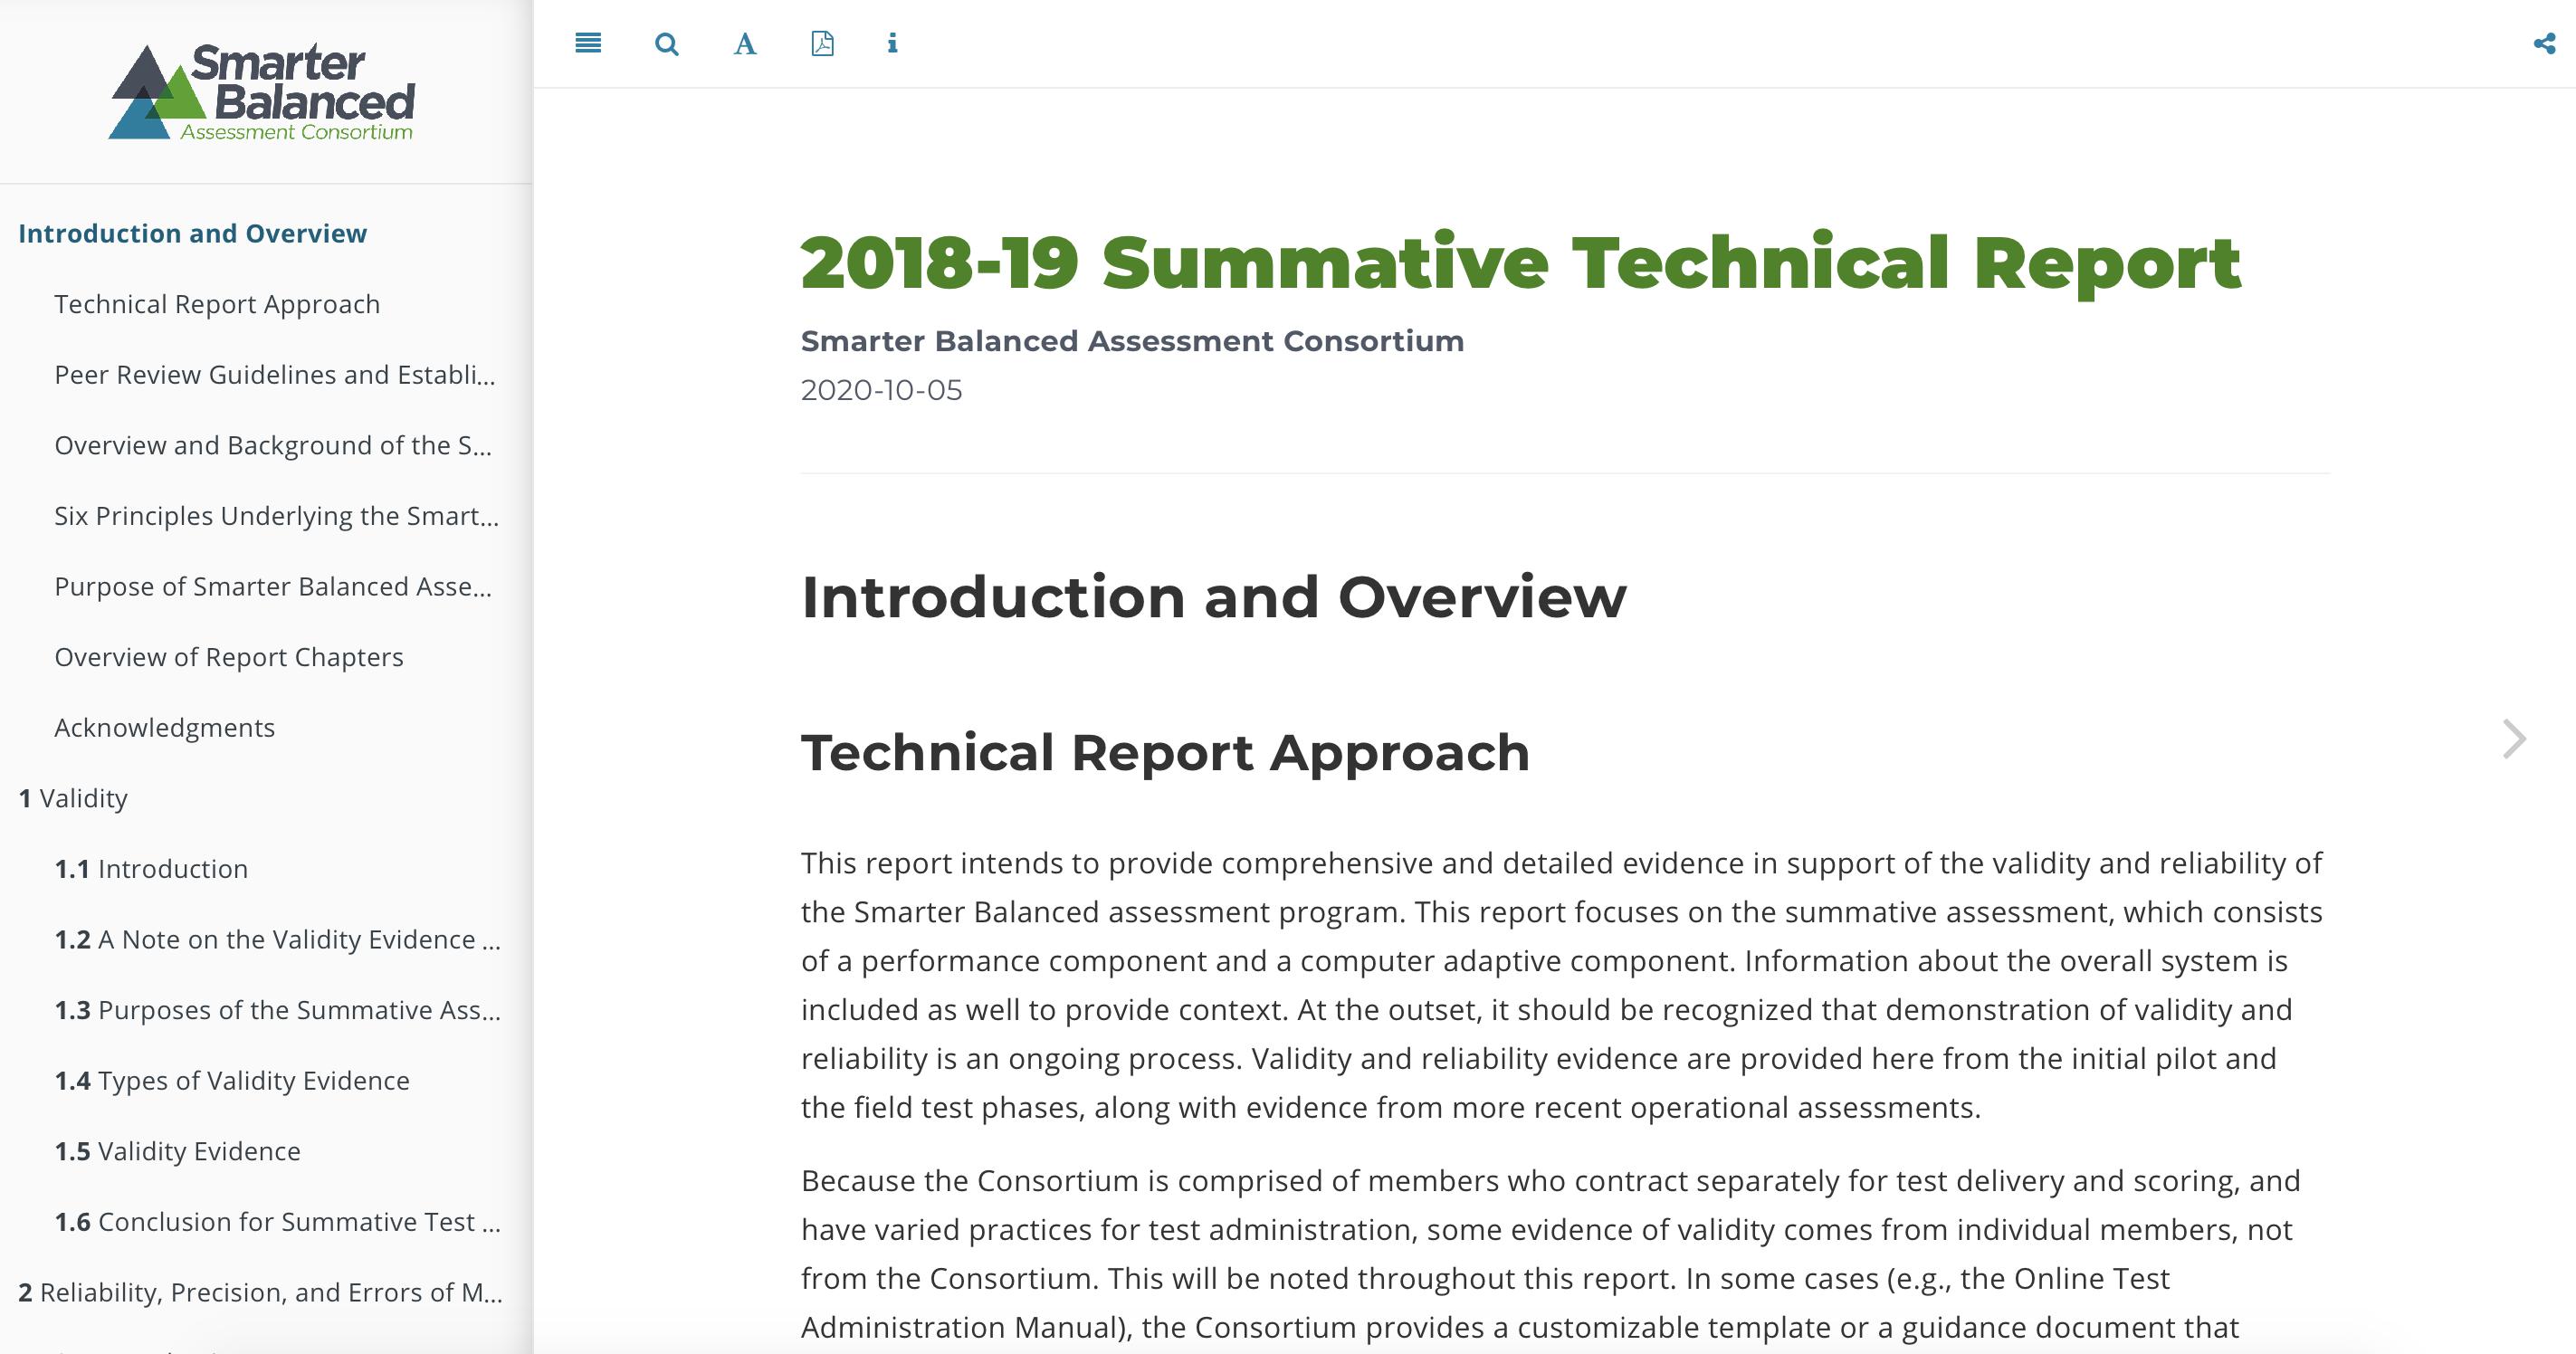 Screenshot of the 2018-19 Summative Technical Report.